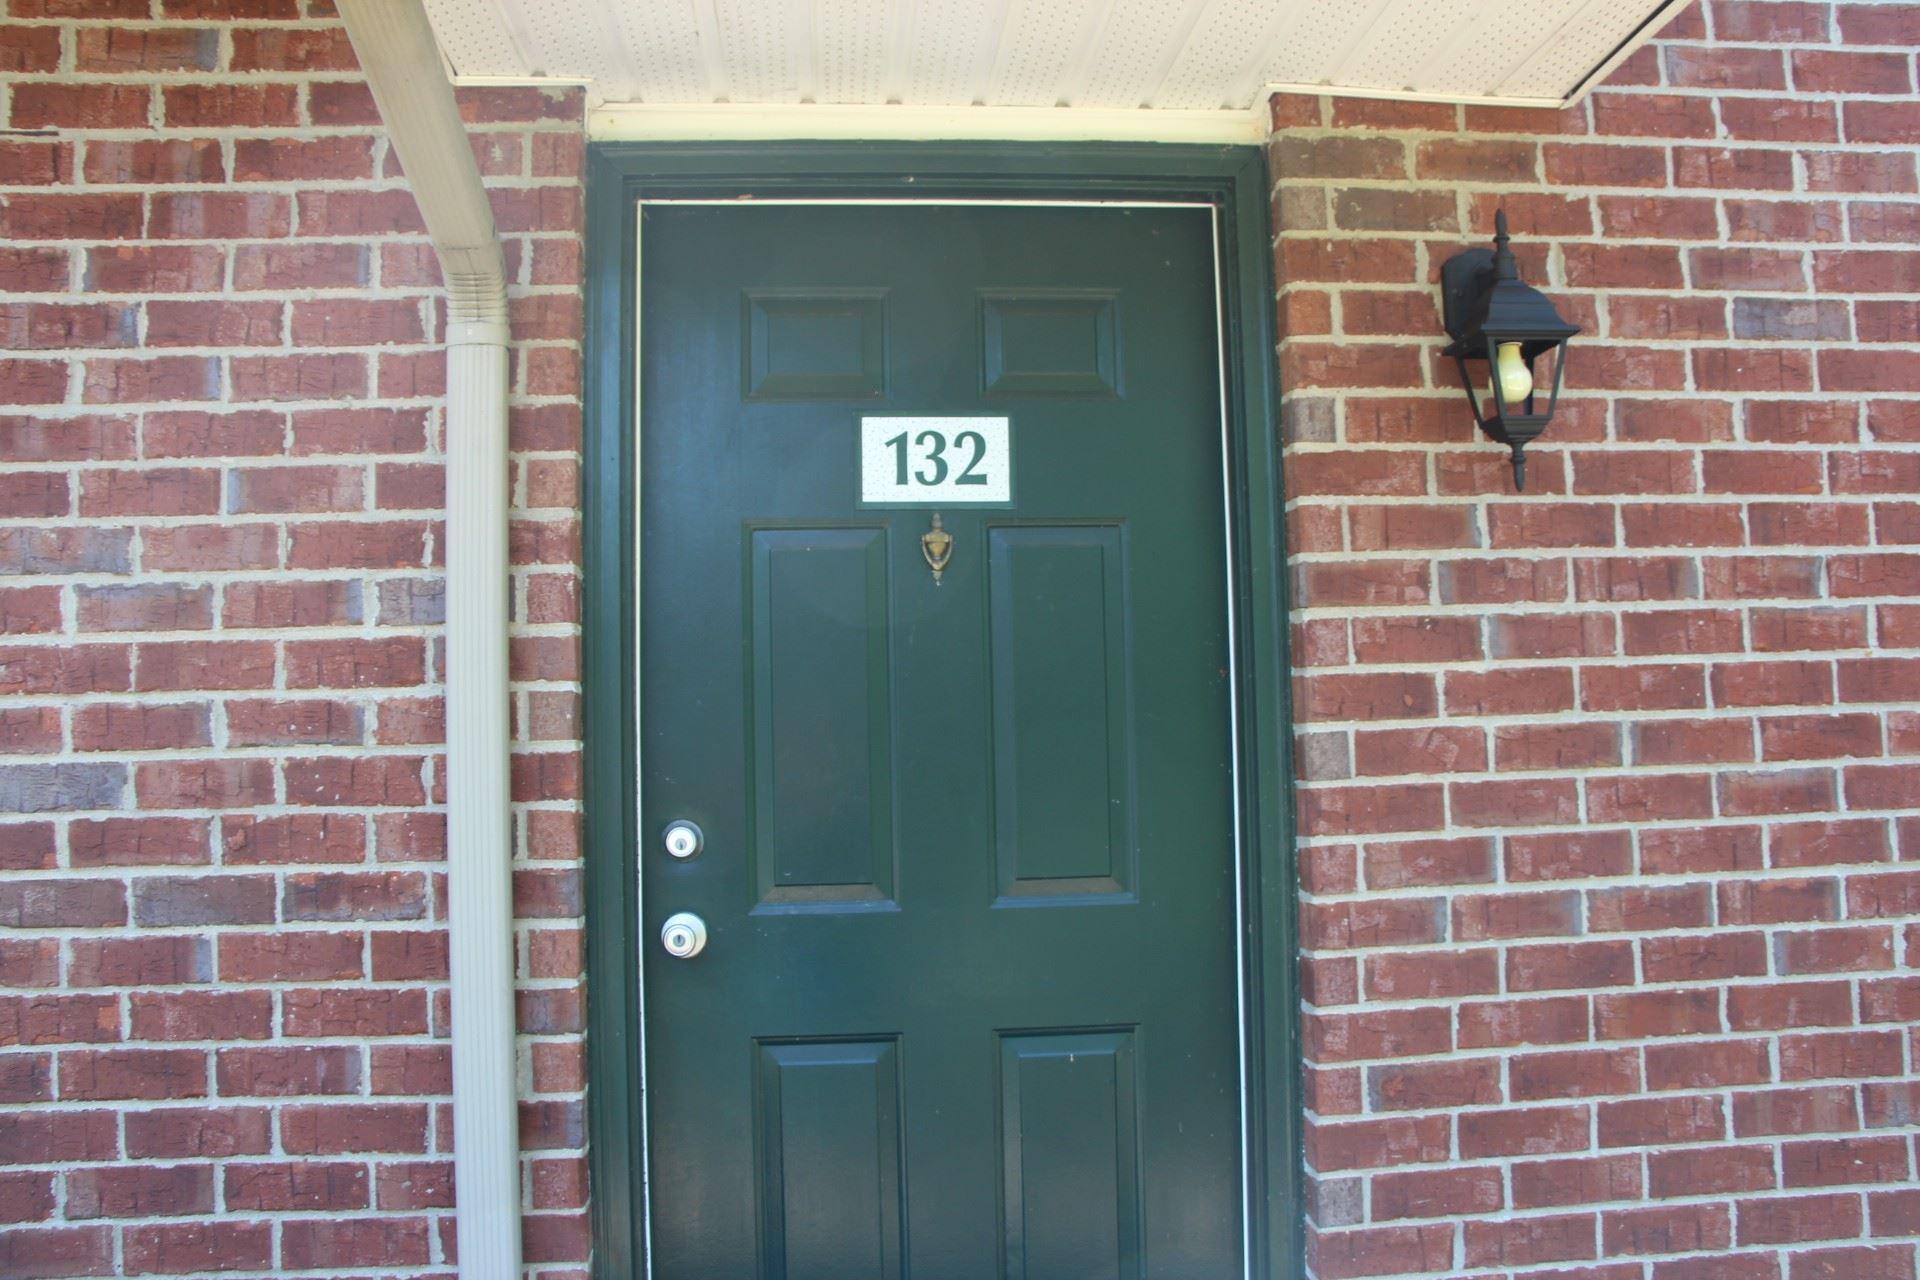 Photo of 132 Waterview Dr #132, Hendersonville, TN 37075 (MLS # 2168924)